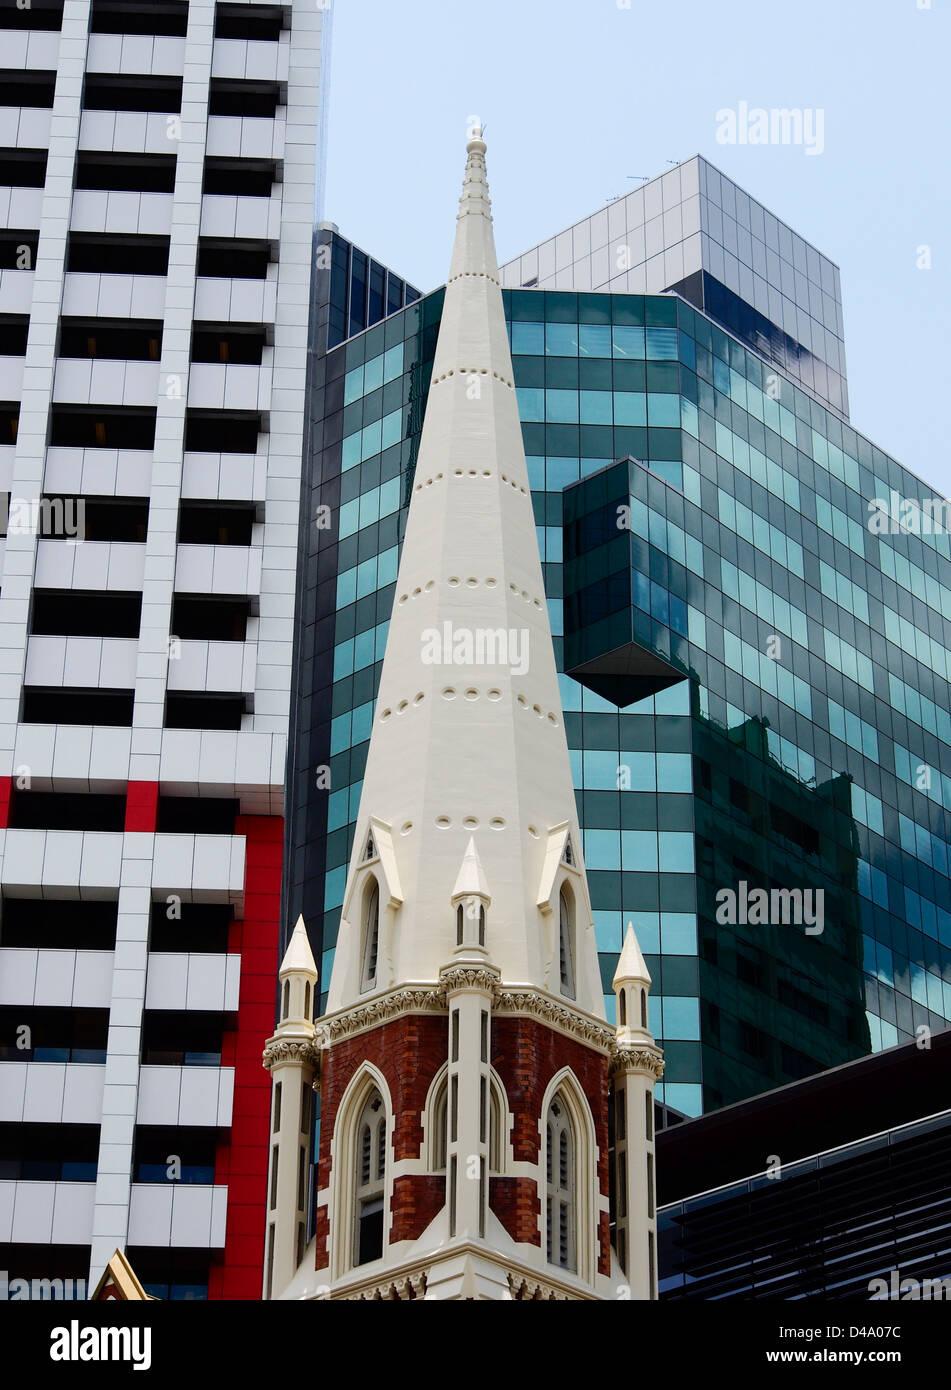 SPIRE OF ALBERT STREET UNITING CHURCH BRISBANE QUEENSLAND AUSTRALIA - Stock Image